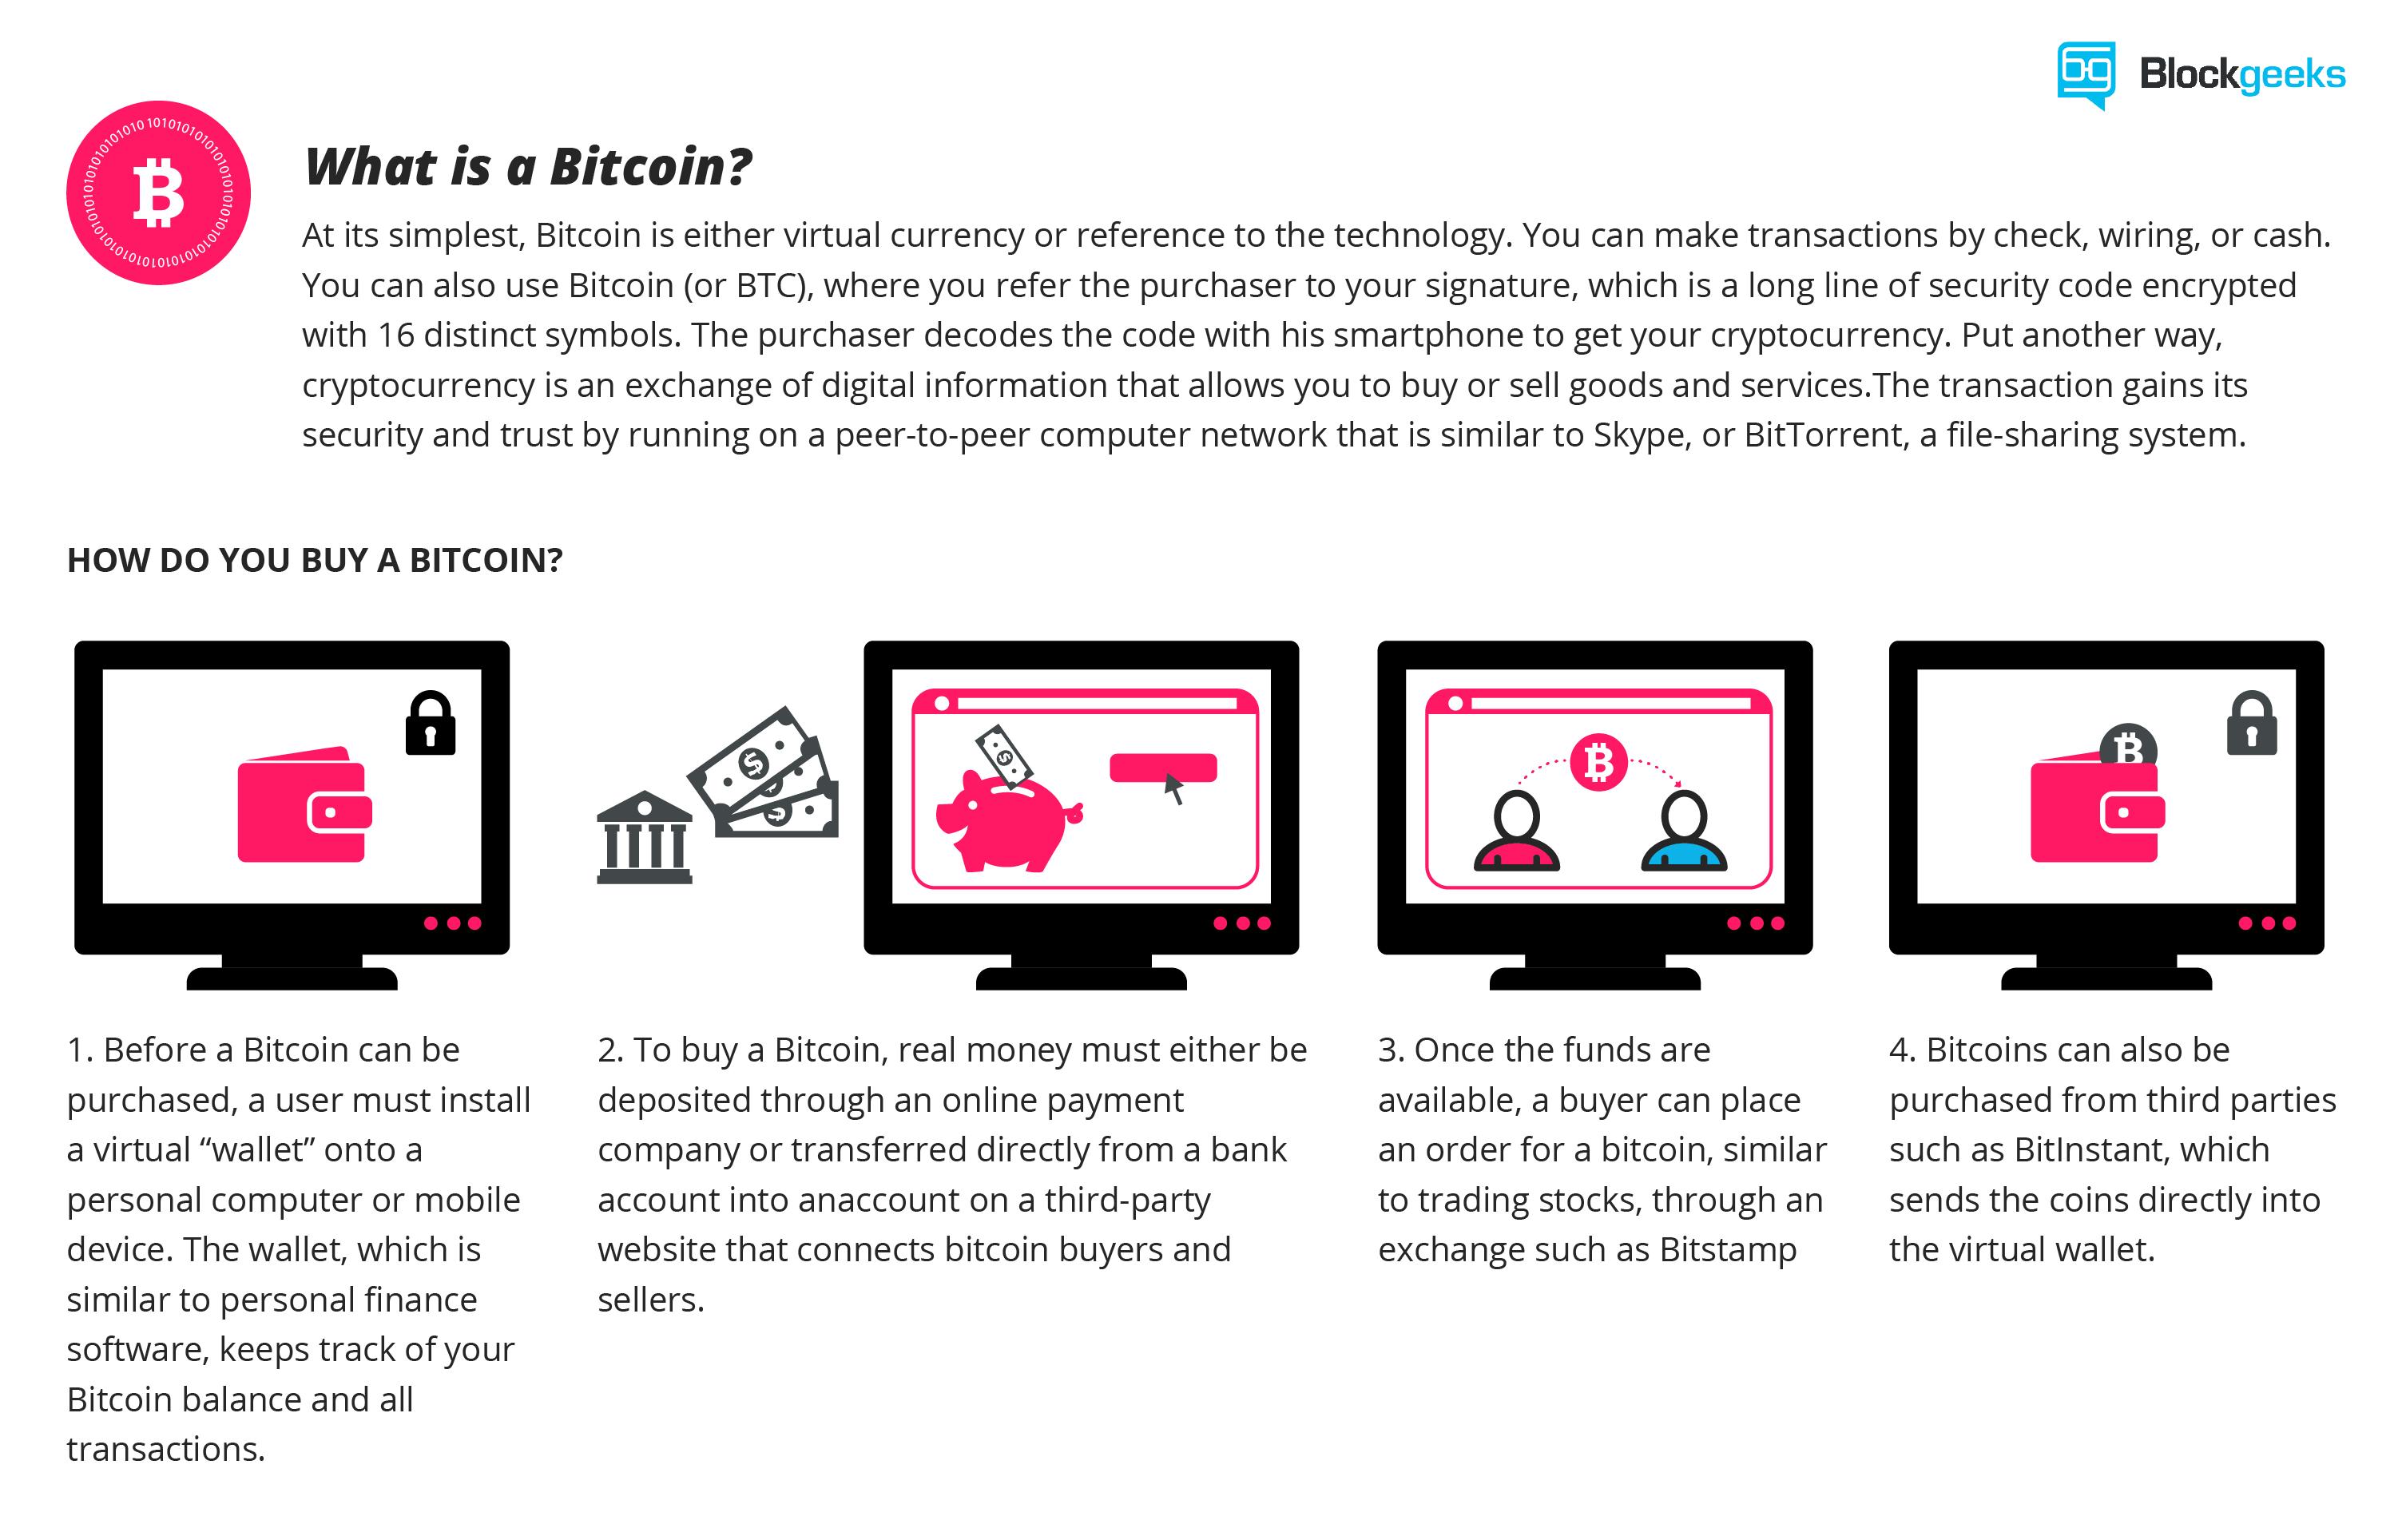 ¿Qué es Bitcoin? Guía paso a paso para principiantes